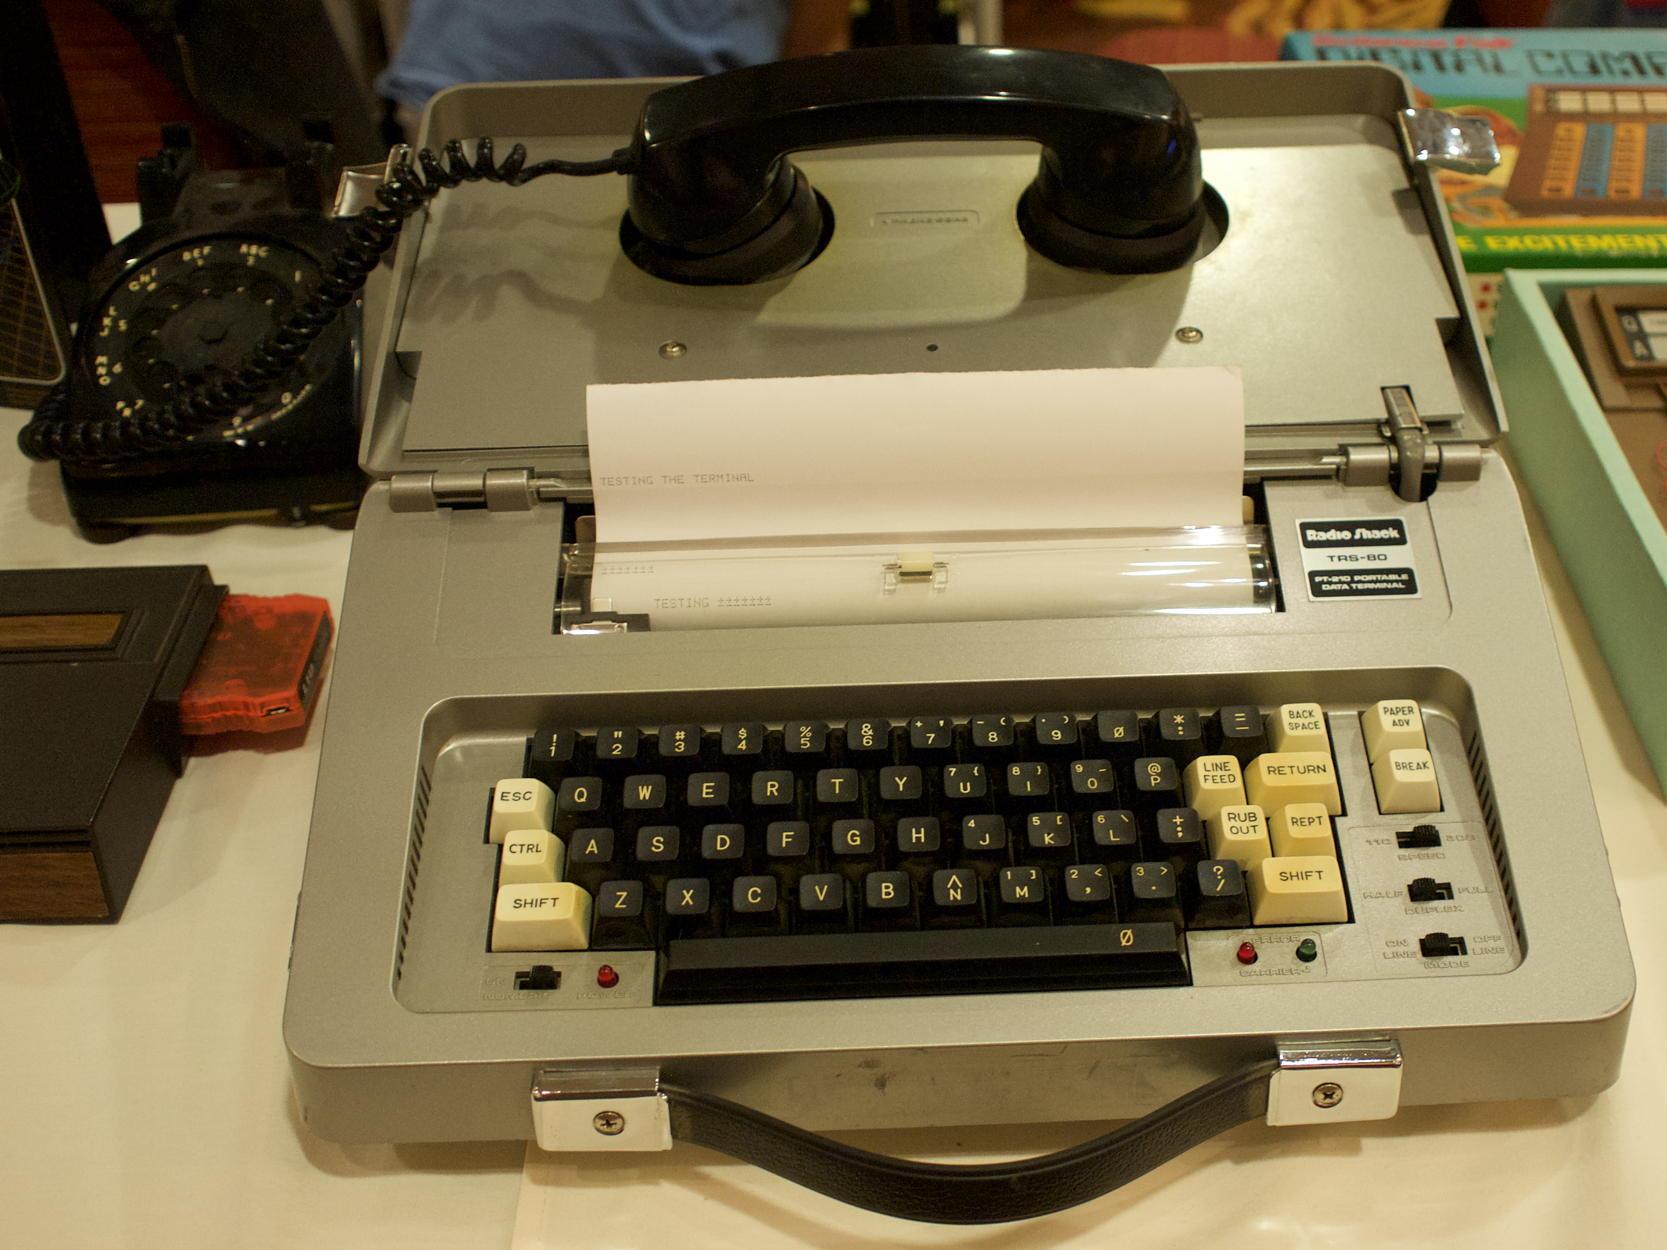 PT-210 Portable Data Terminal